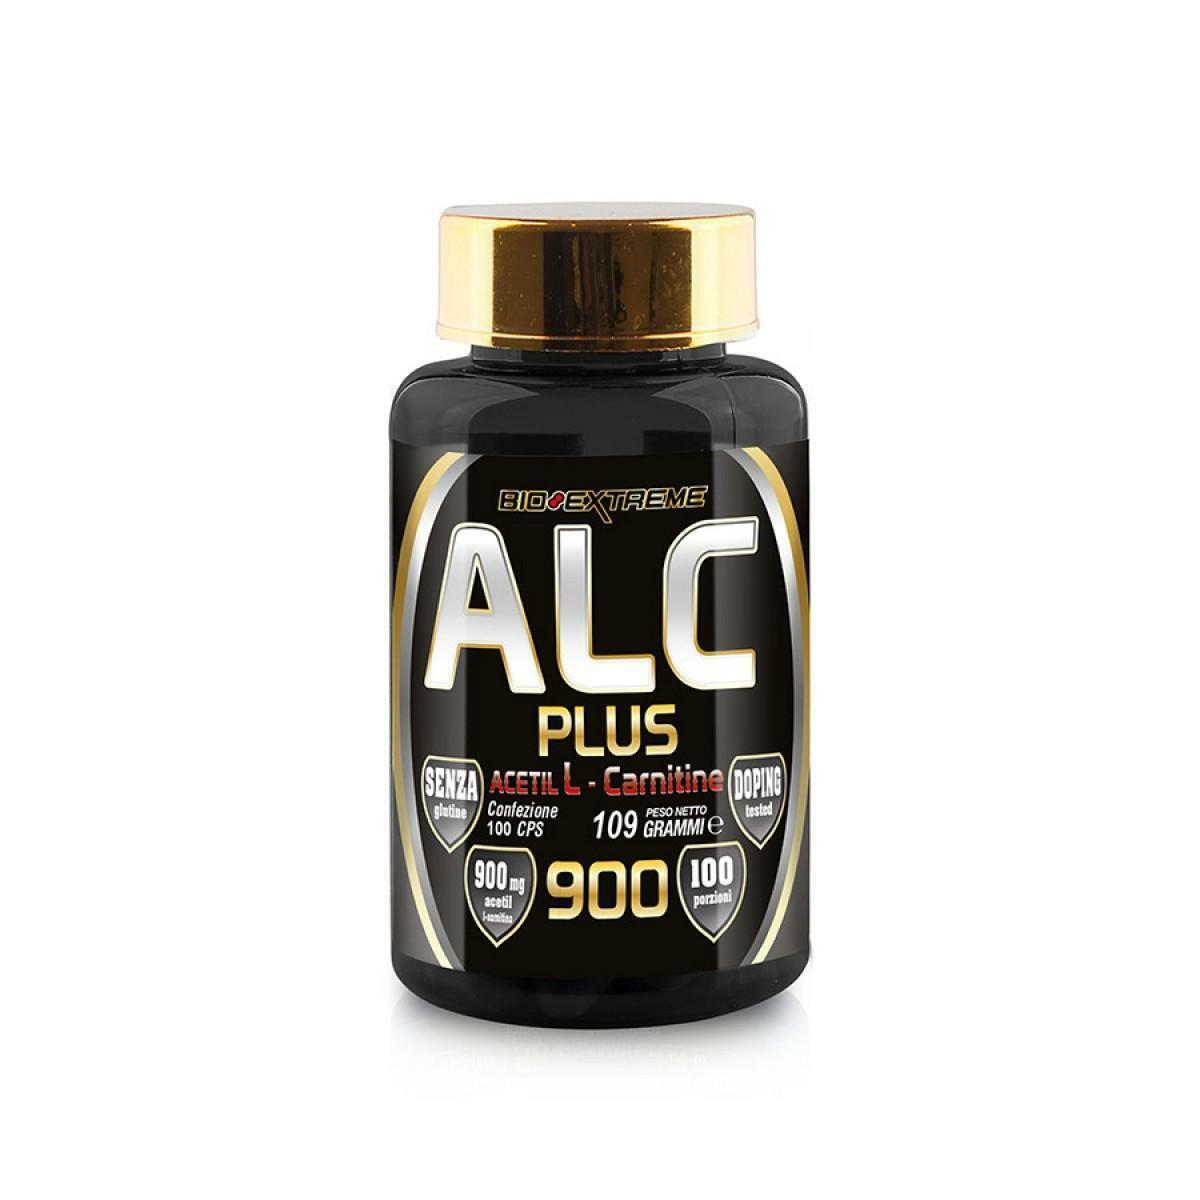 bio extreme bio extreme - alc plus - acetil l - carnitine 900 - 100 cps